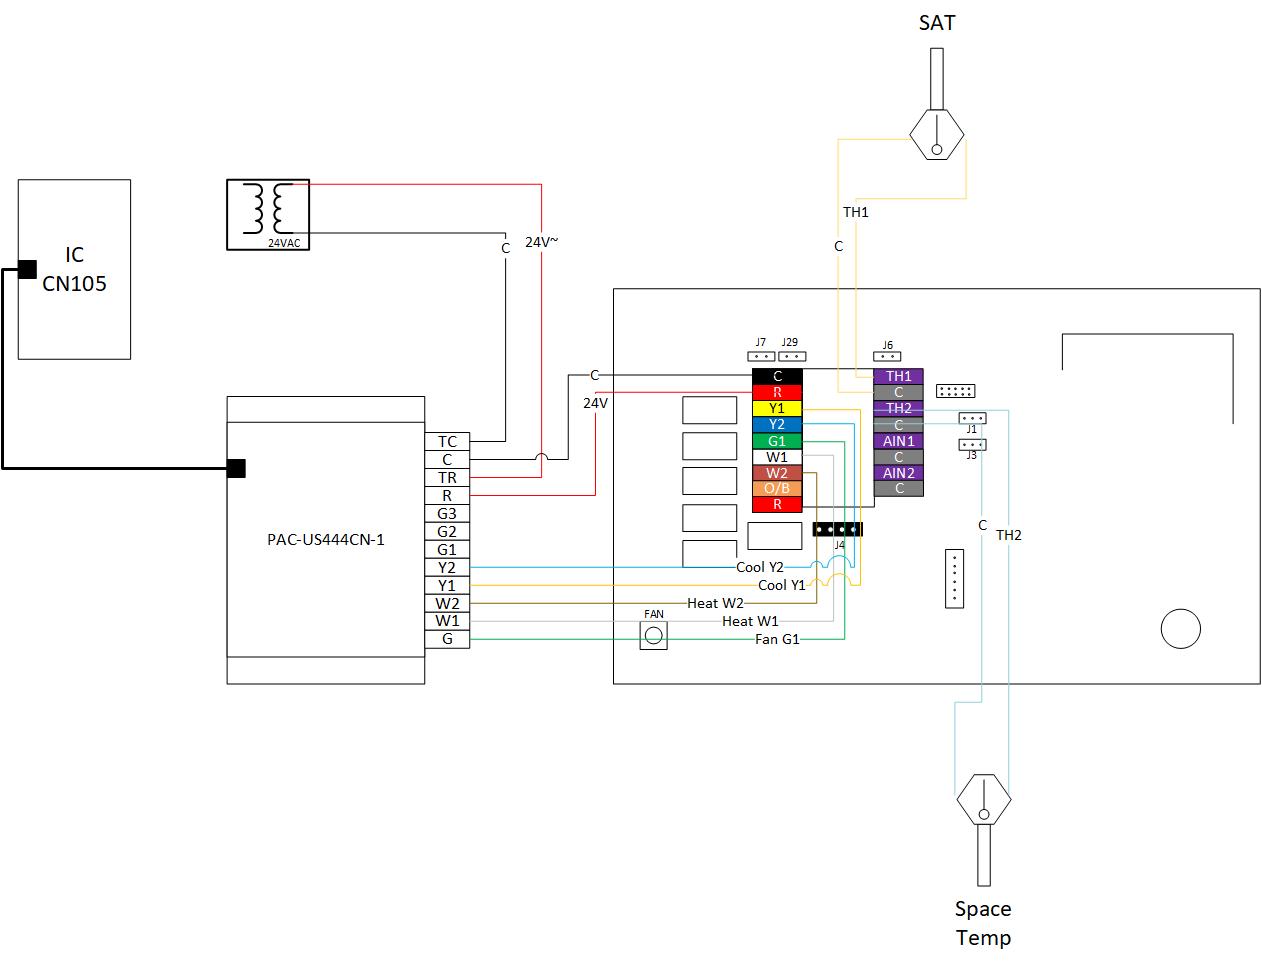 mitsubishi vrf control with smart stat  u2013 75f